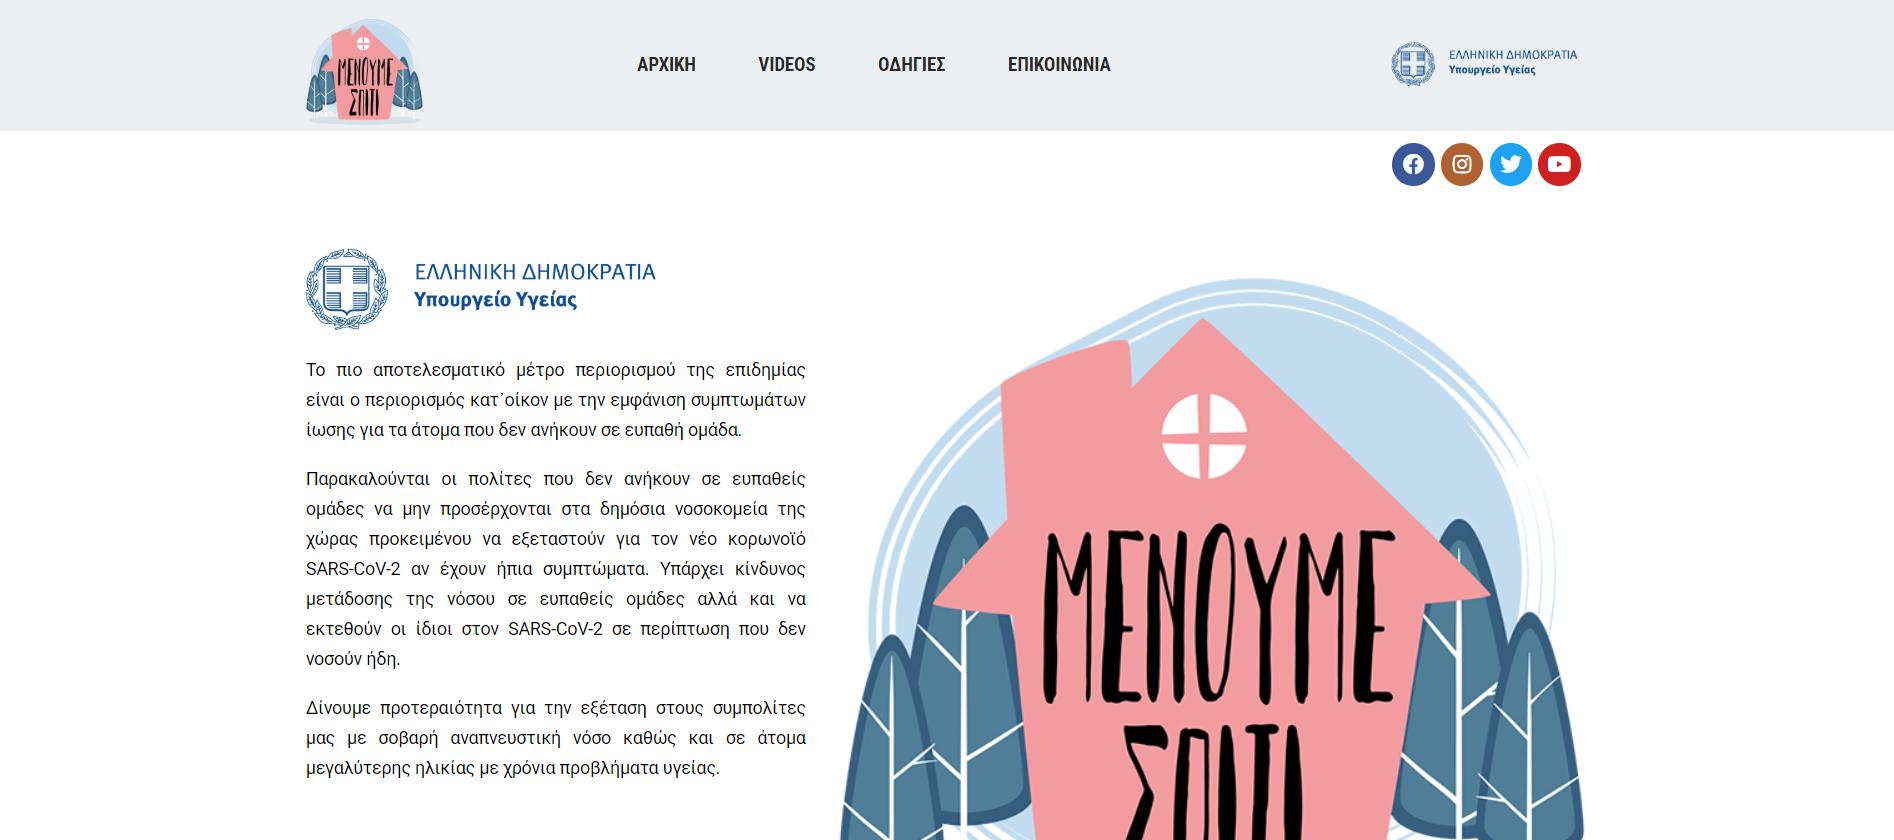 menoumespiti.gr Διαθέσιμη η νέα ιστοσελίδα menoumespiti.gr